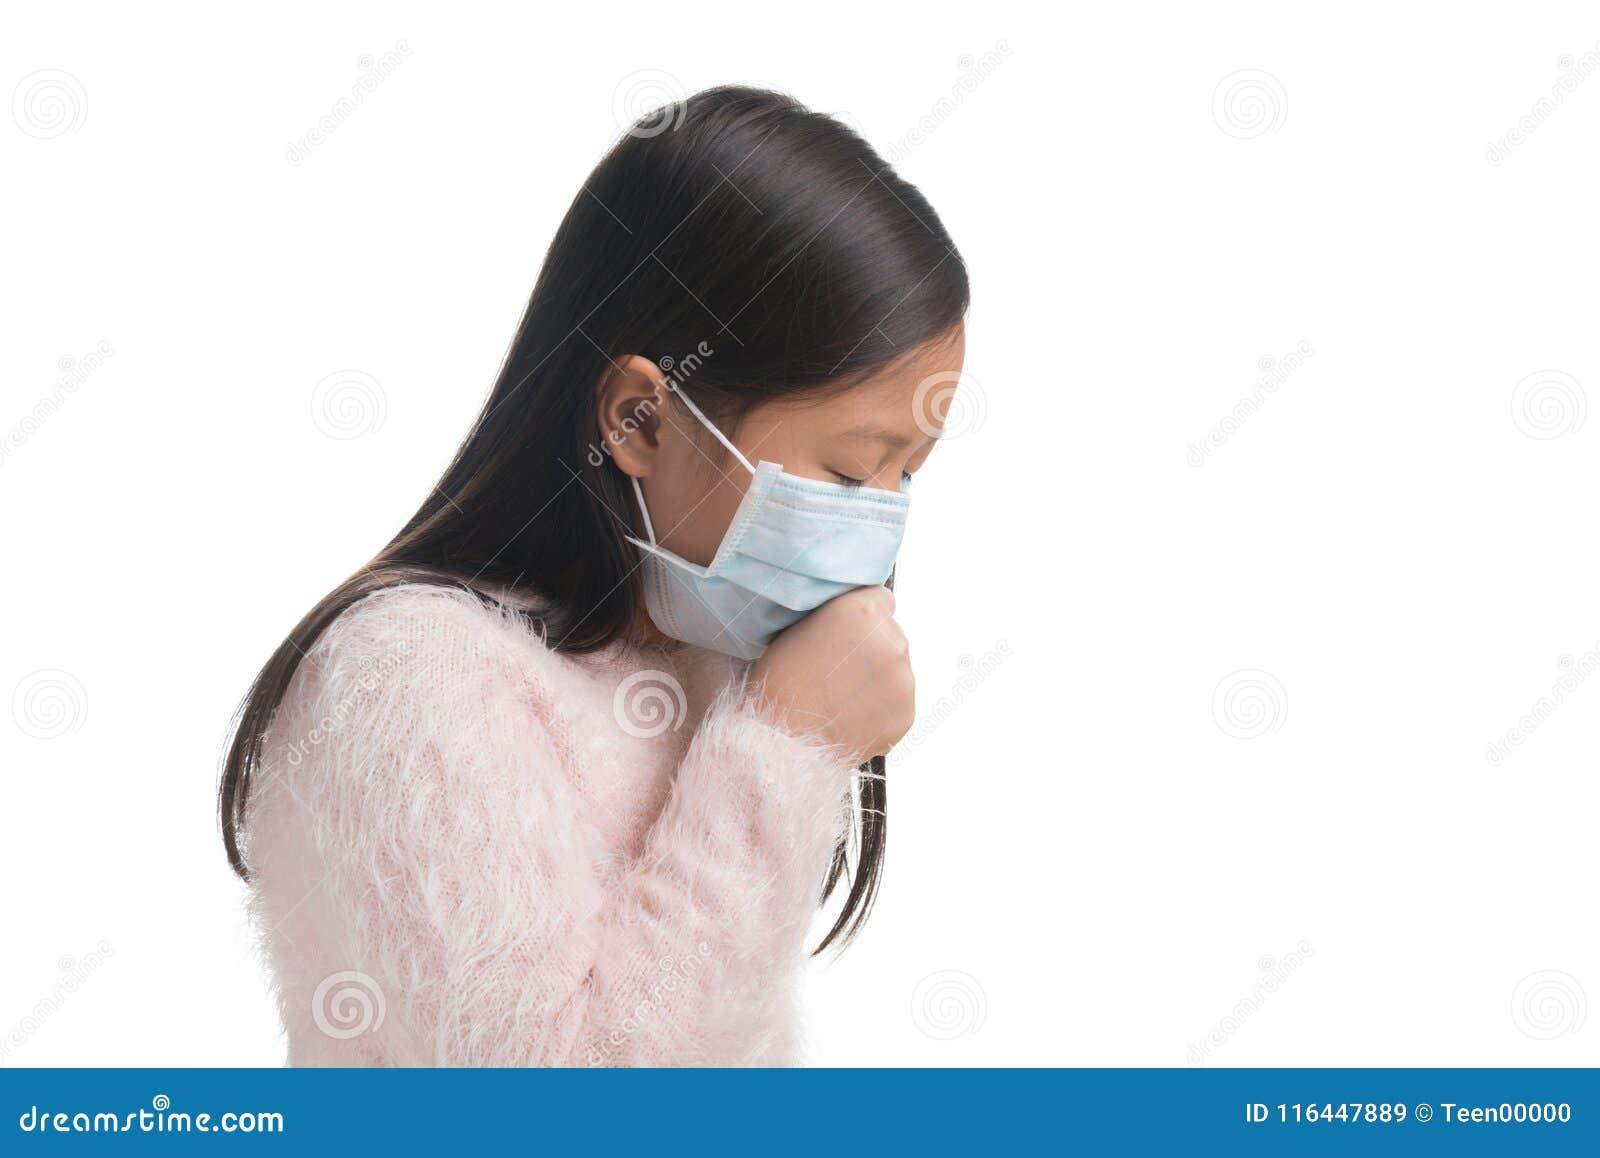 masque enfant protection virus